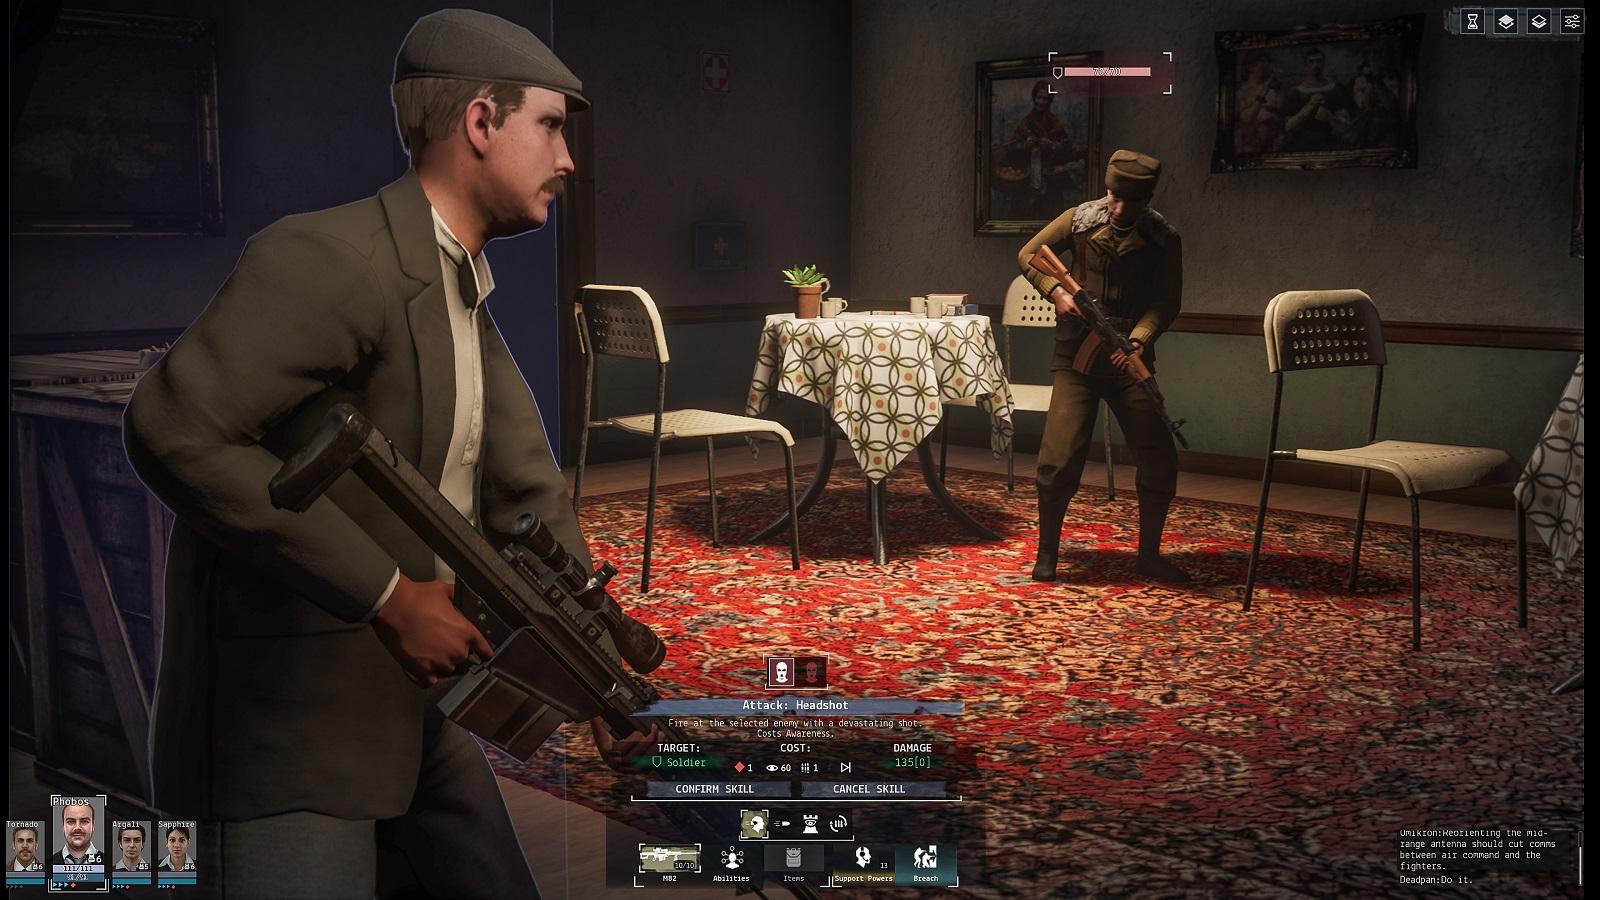 Phantom Doctrine, Indie Game, Review, Рецензия, Обзор, Мнение, Отзыв